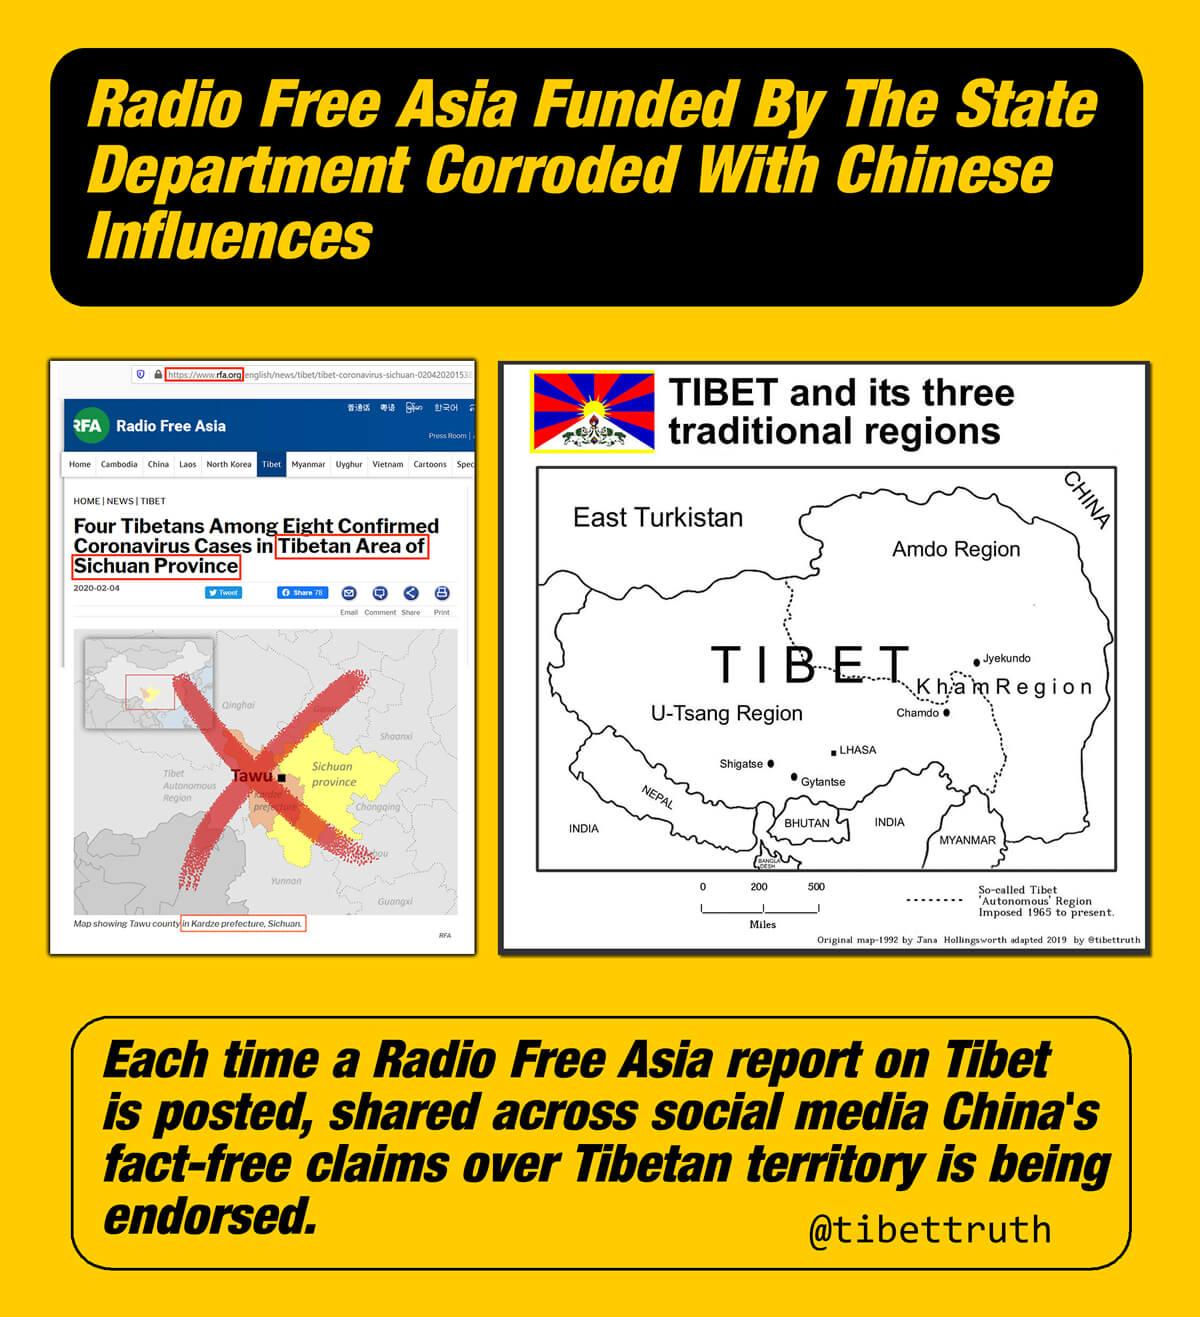 Radio Free Asia's Tibetan Service Endorsing Chinese Claims On Tibet